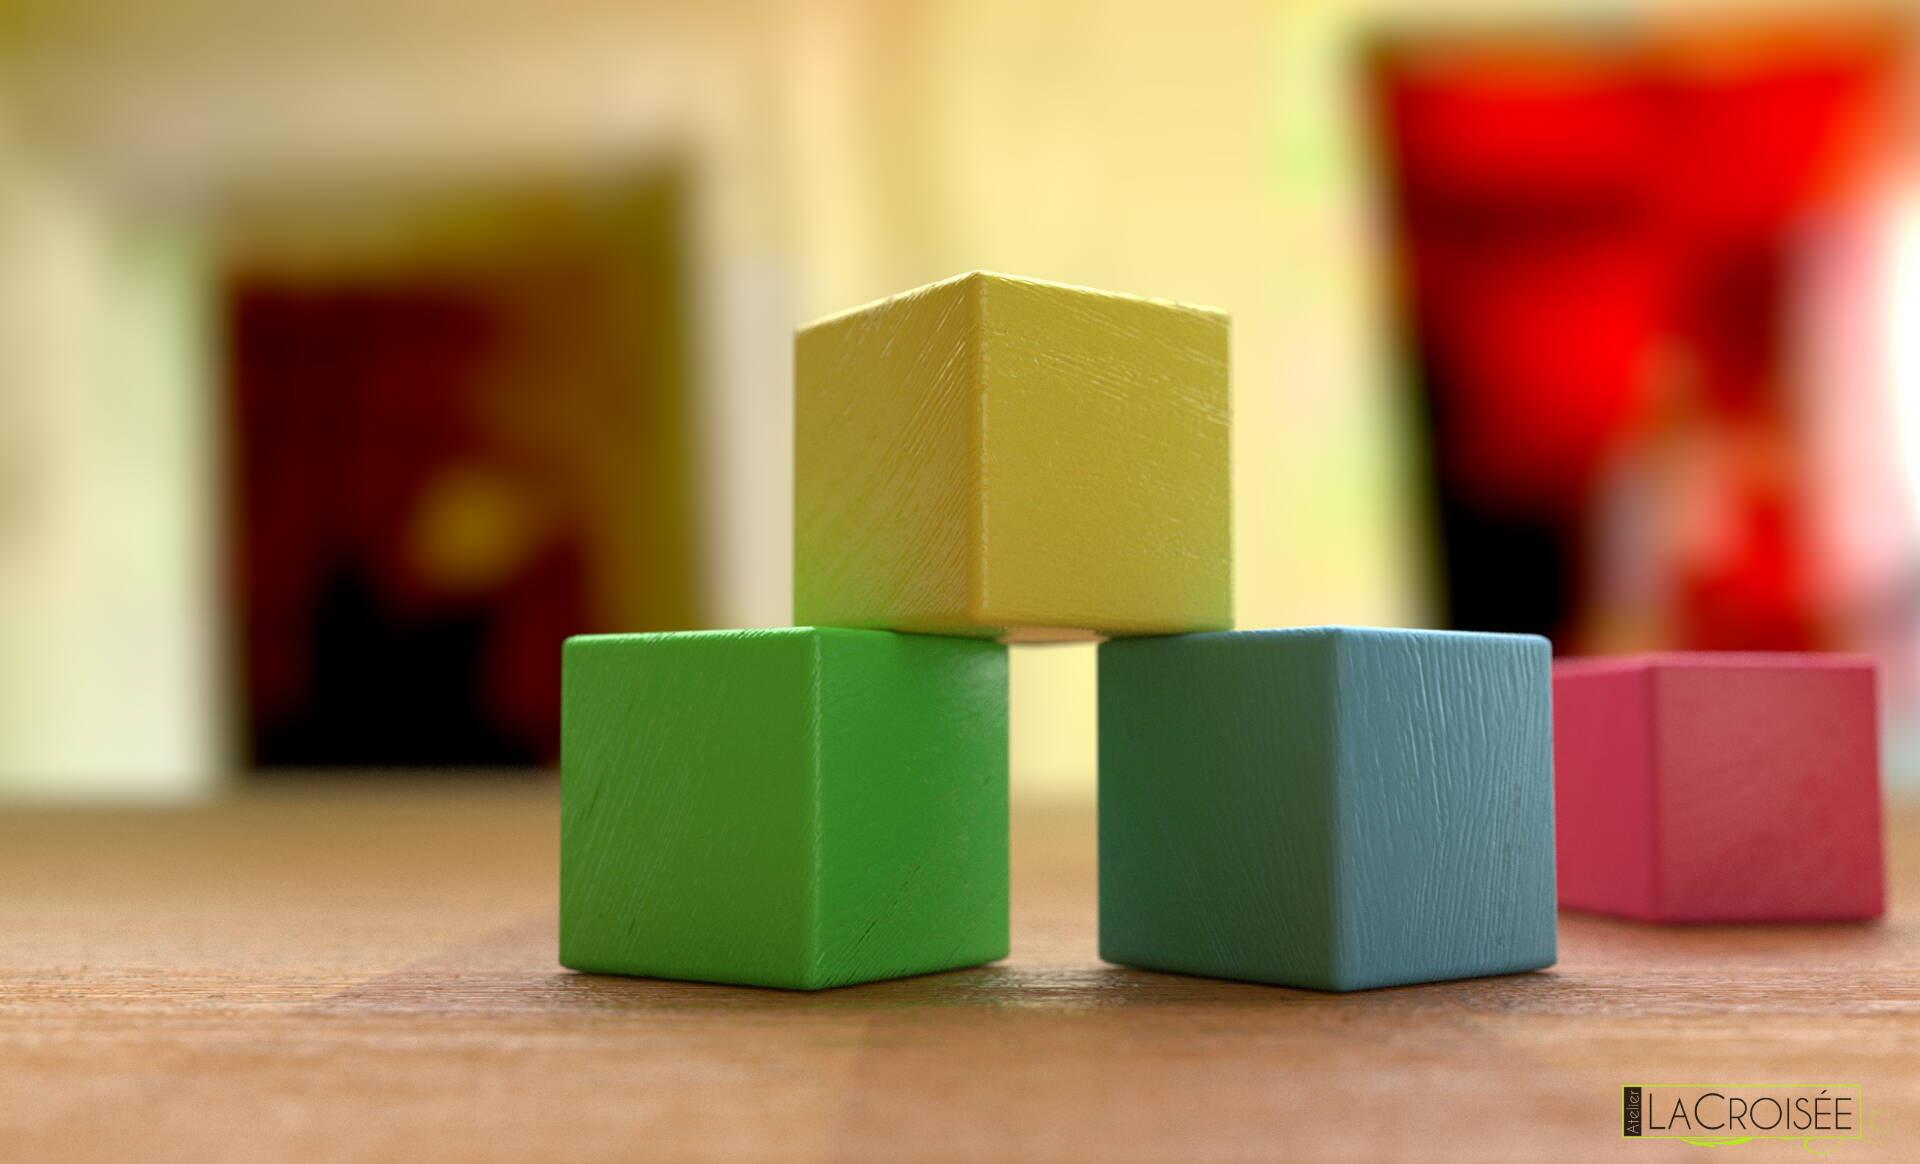 modélisation-blender-cubes-bois